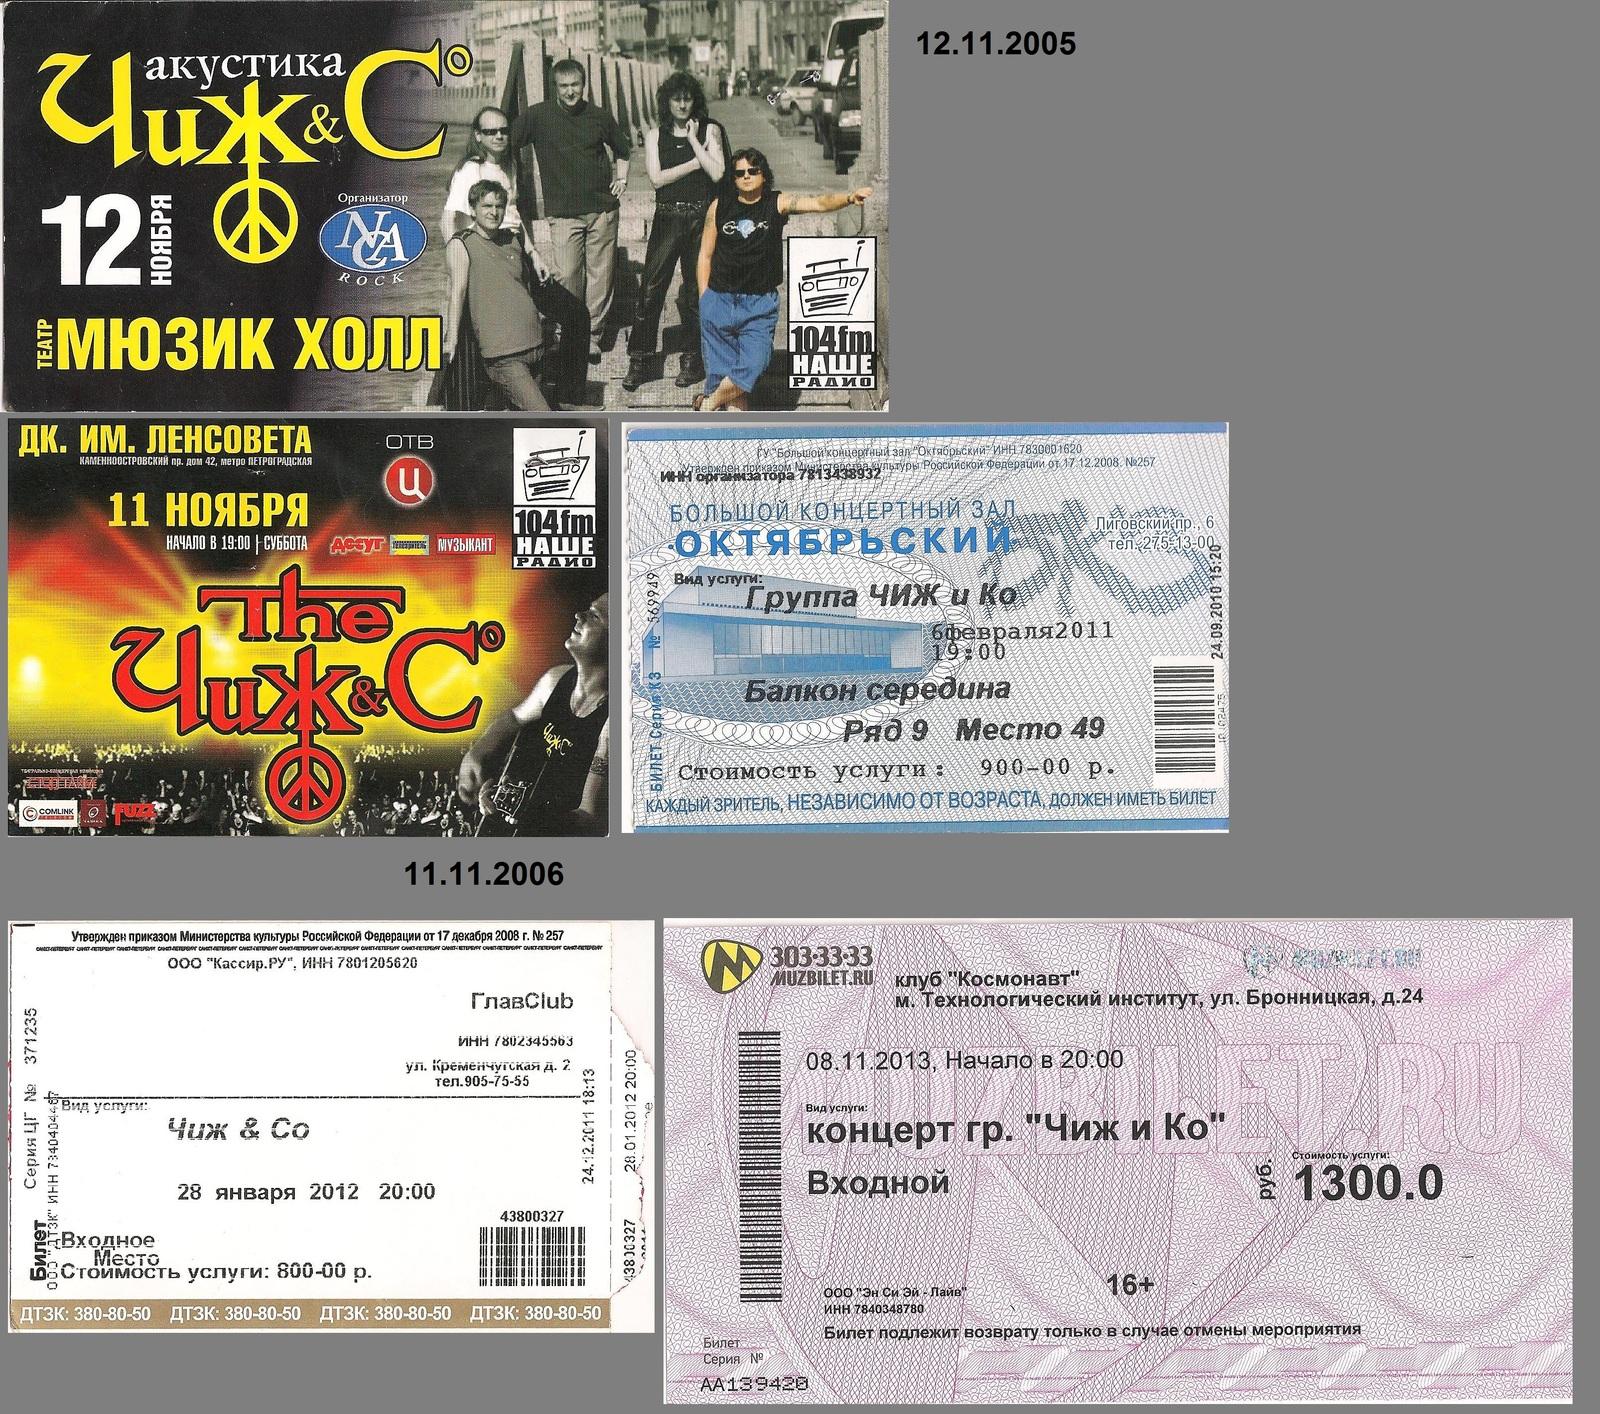 Билеты на концерты 2010 афиша чебоксары концерты чувашской